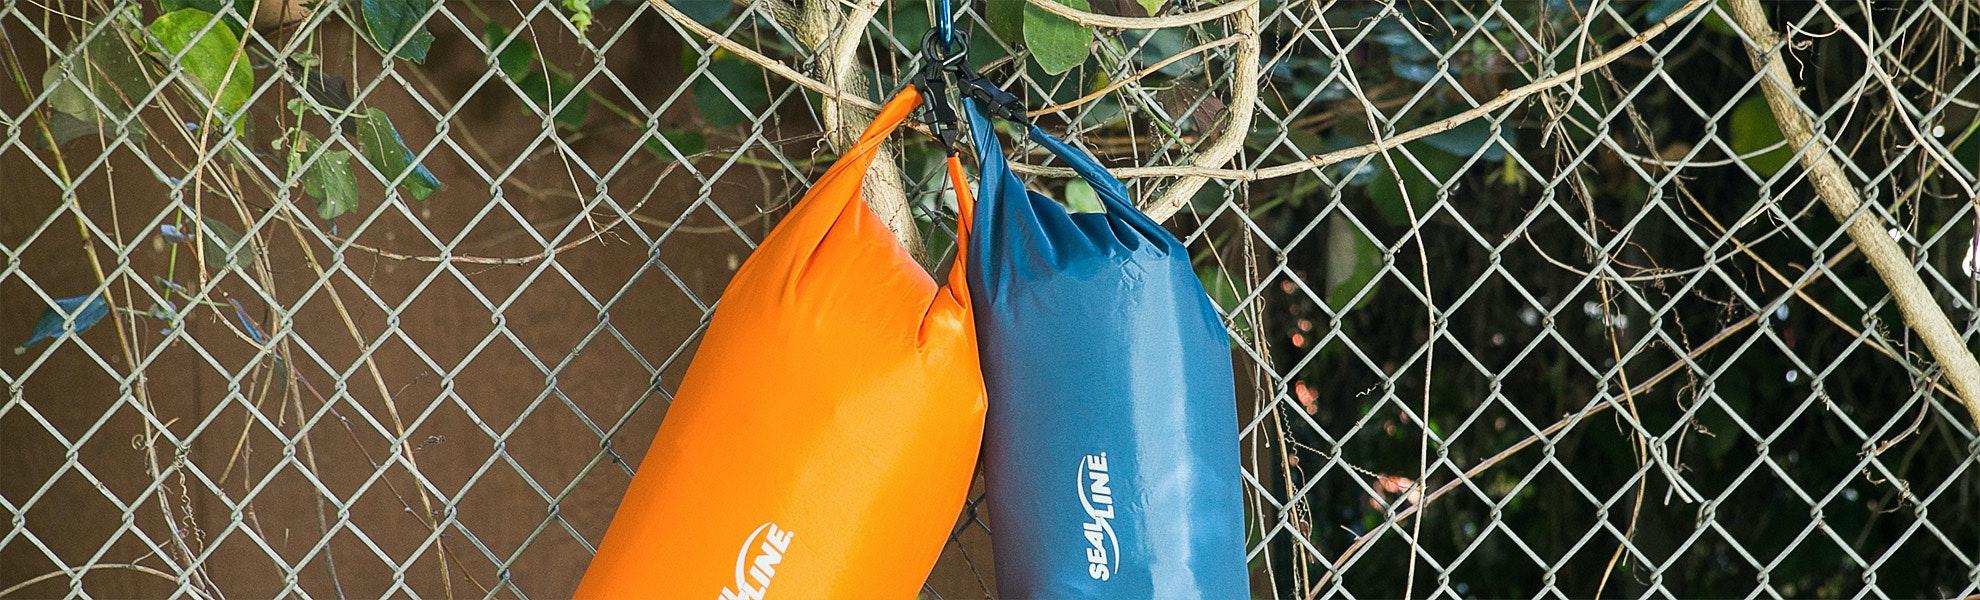 SealLine Storm Dry Sacks